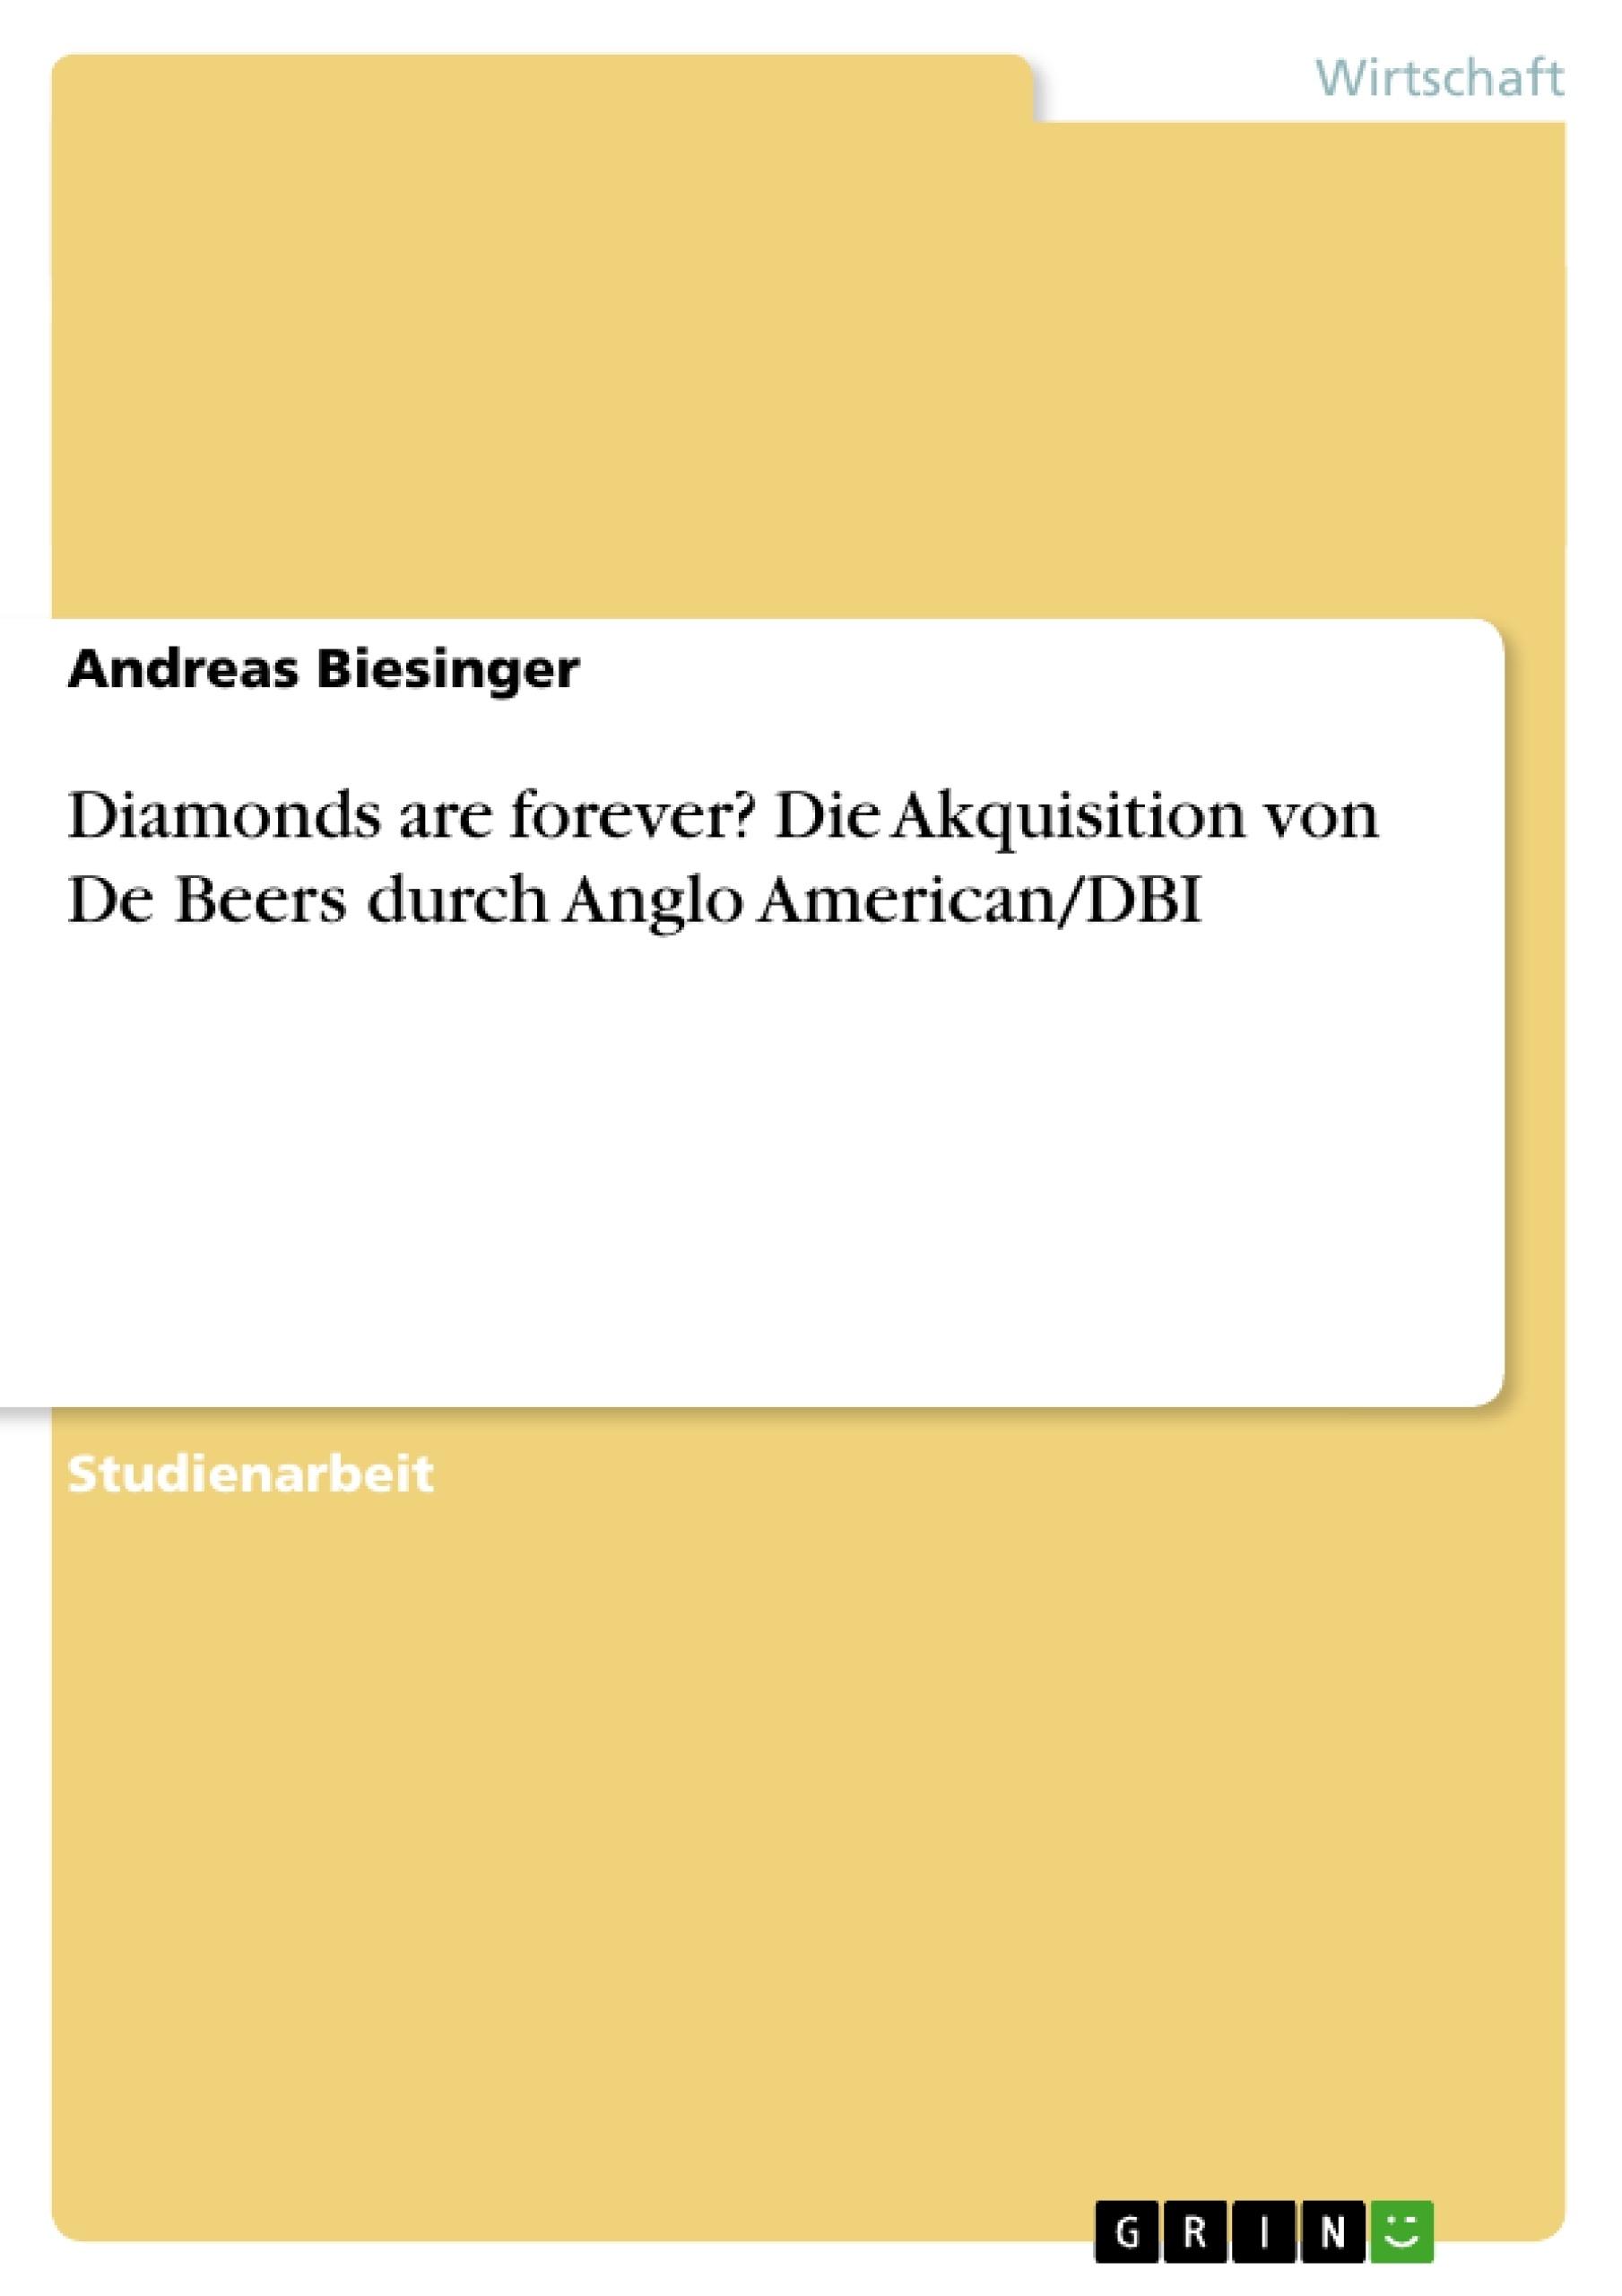 Titel: Diamonds are forever? Die Akquisition von De Beers durch Anglo American/DBI